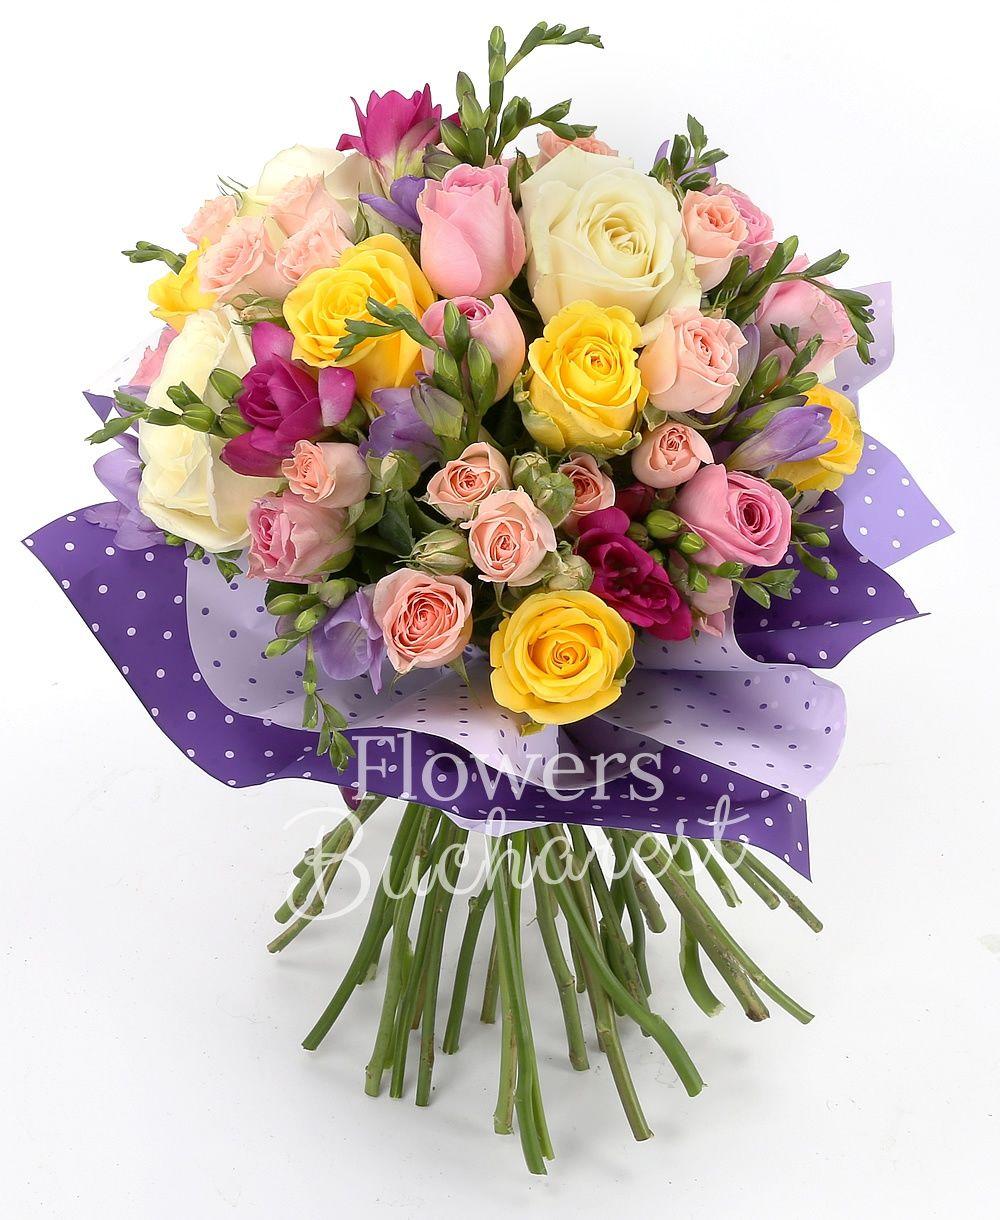 5 yellow roses, 4 white roses, 5 pink roses, 5 pink miniroses, 5 cyclam freesias, 5 mauve freesias